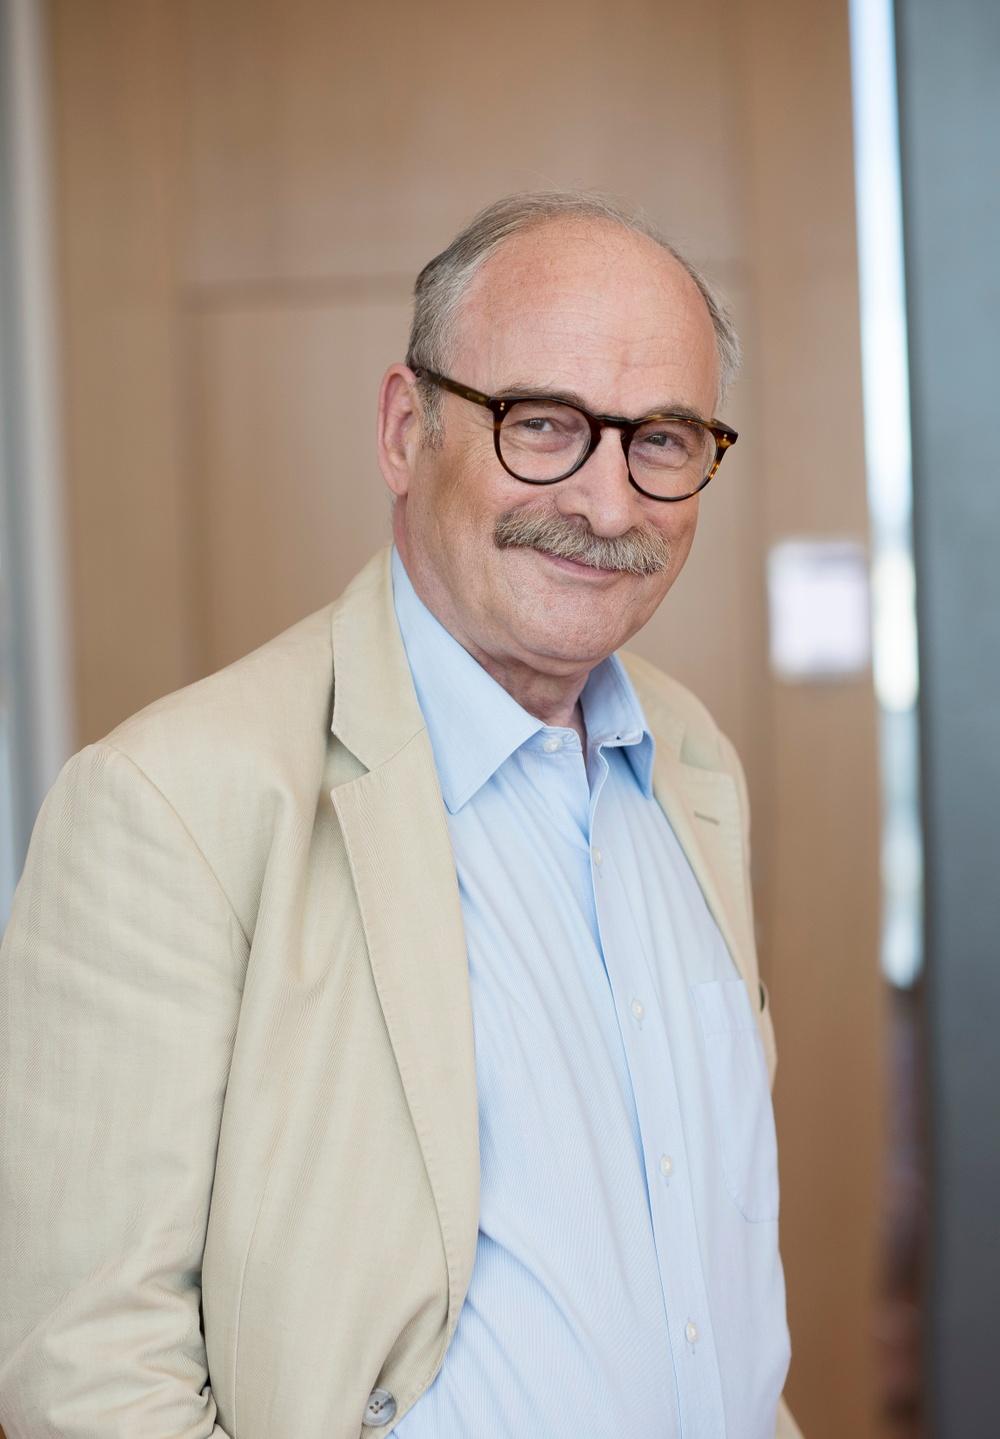 Thomas Fürth, Research Director